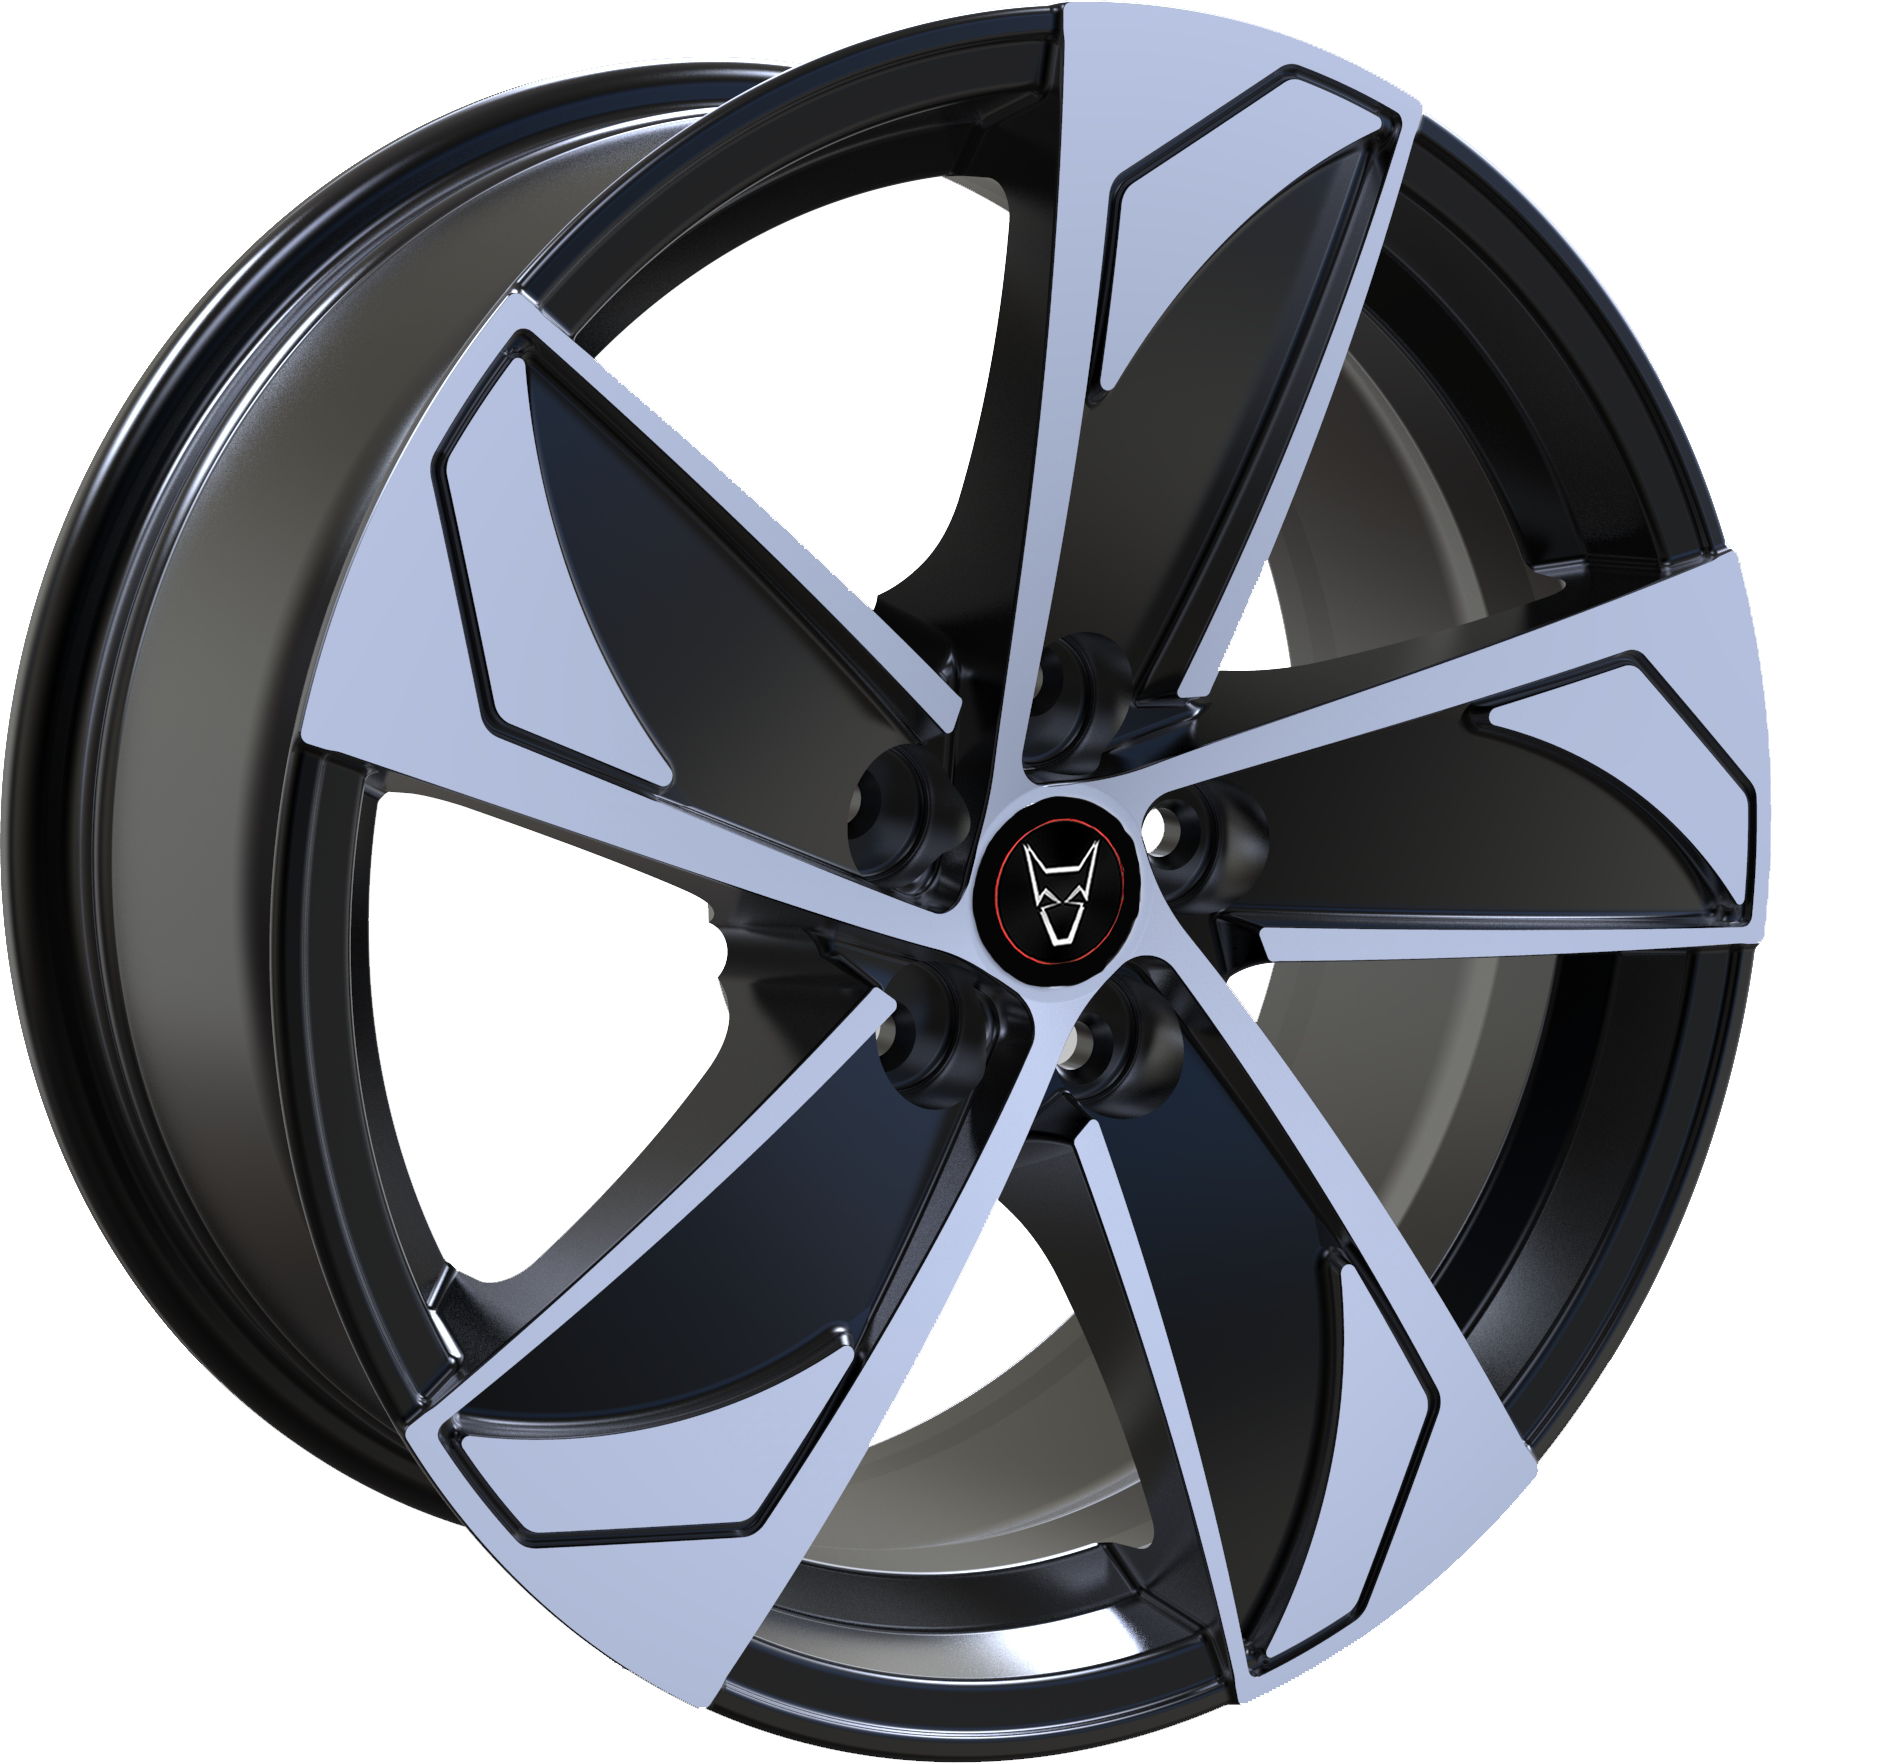 Wolfrace Eurosport AD5 Gloss Black / Polished